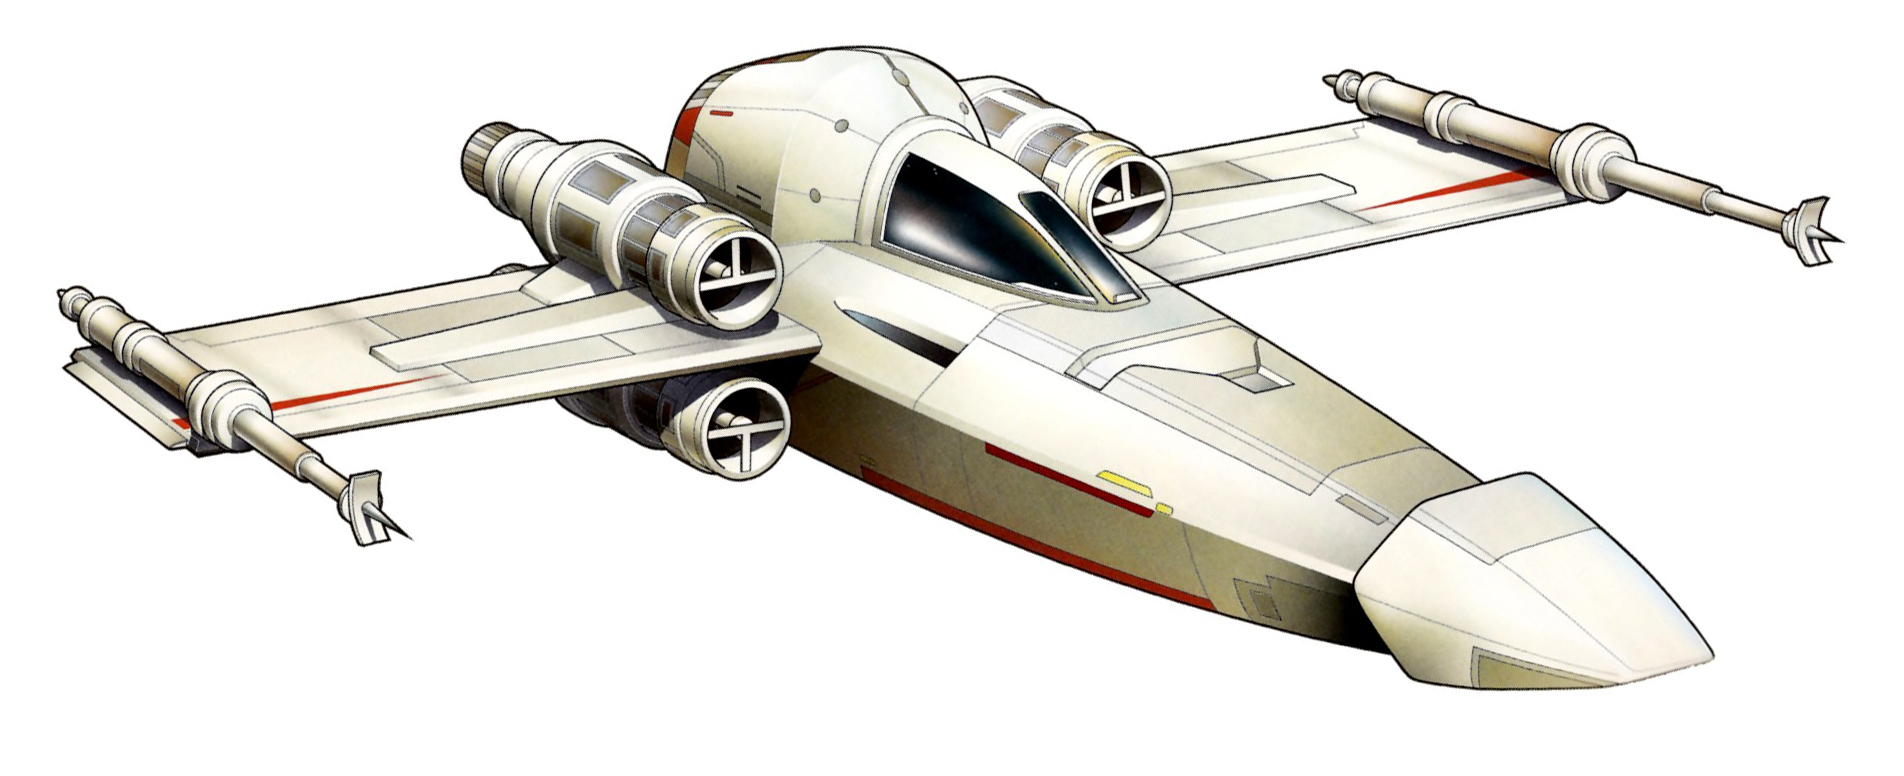 Z-95 Headhunter